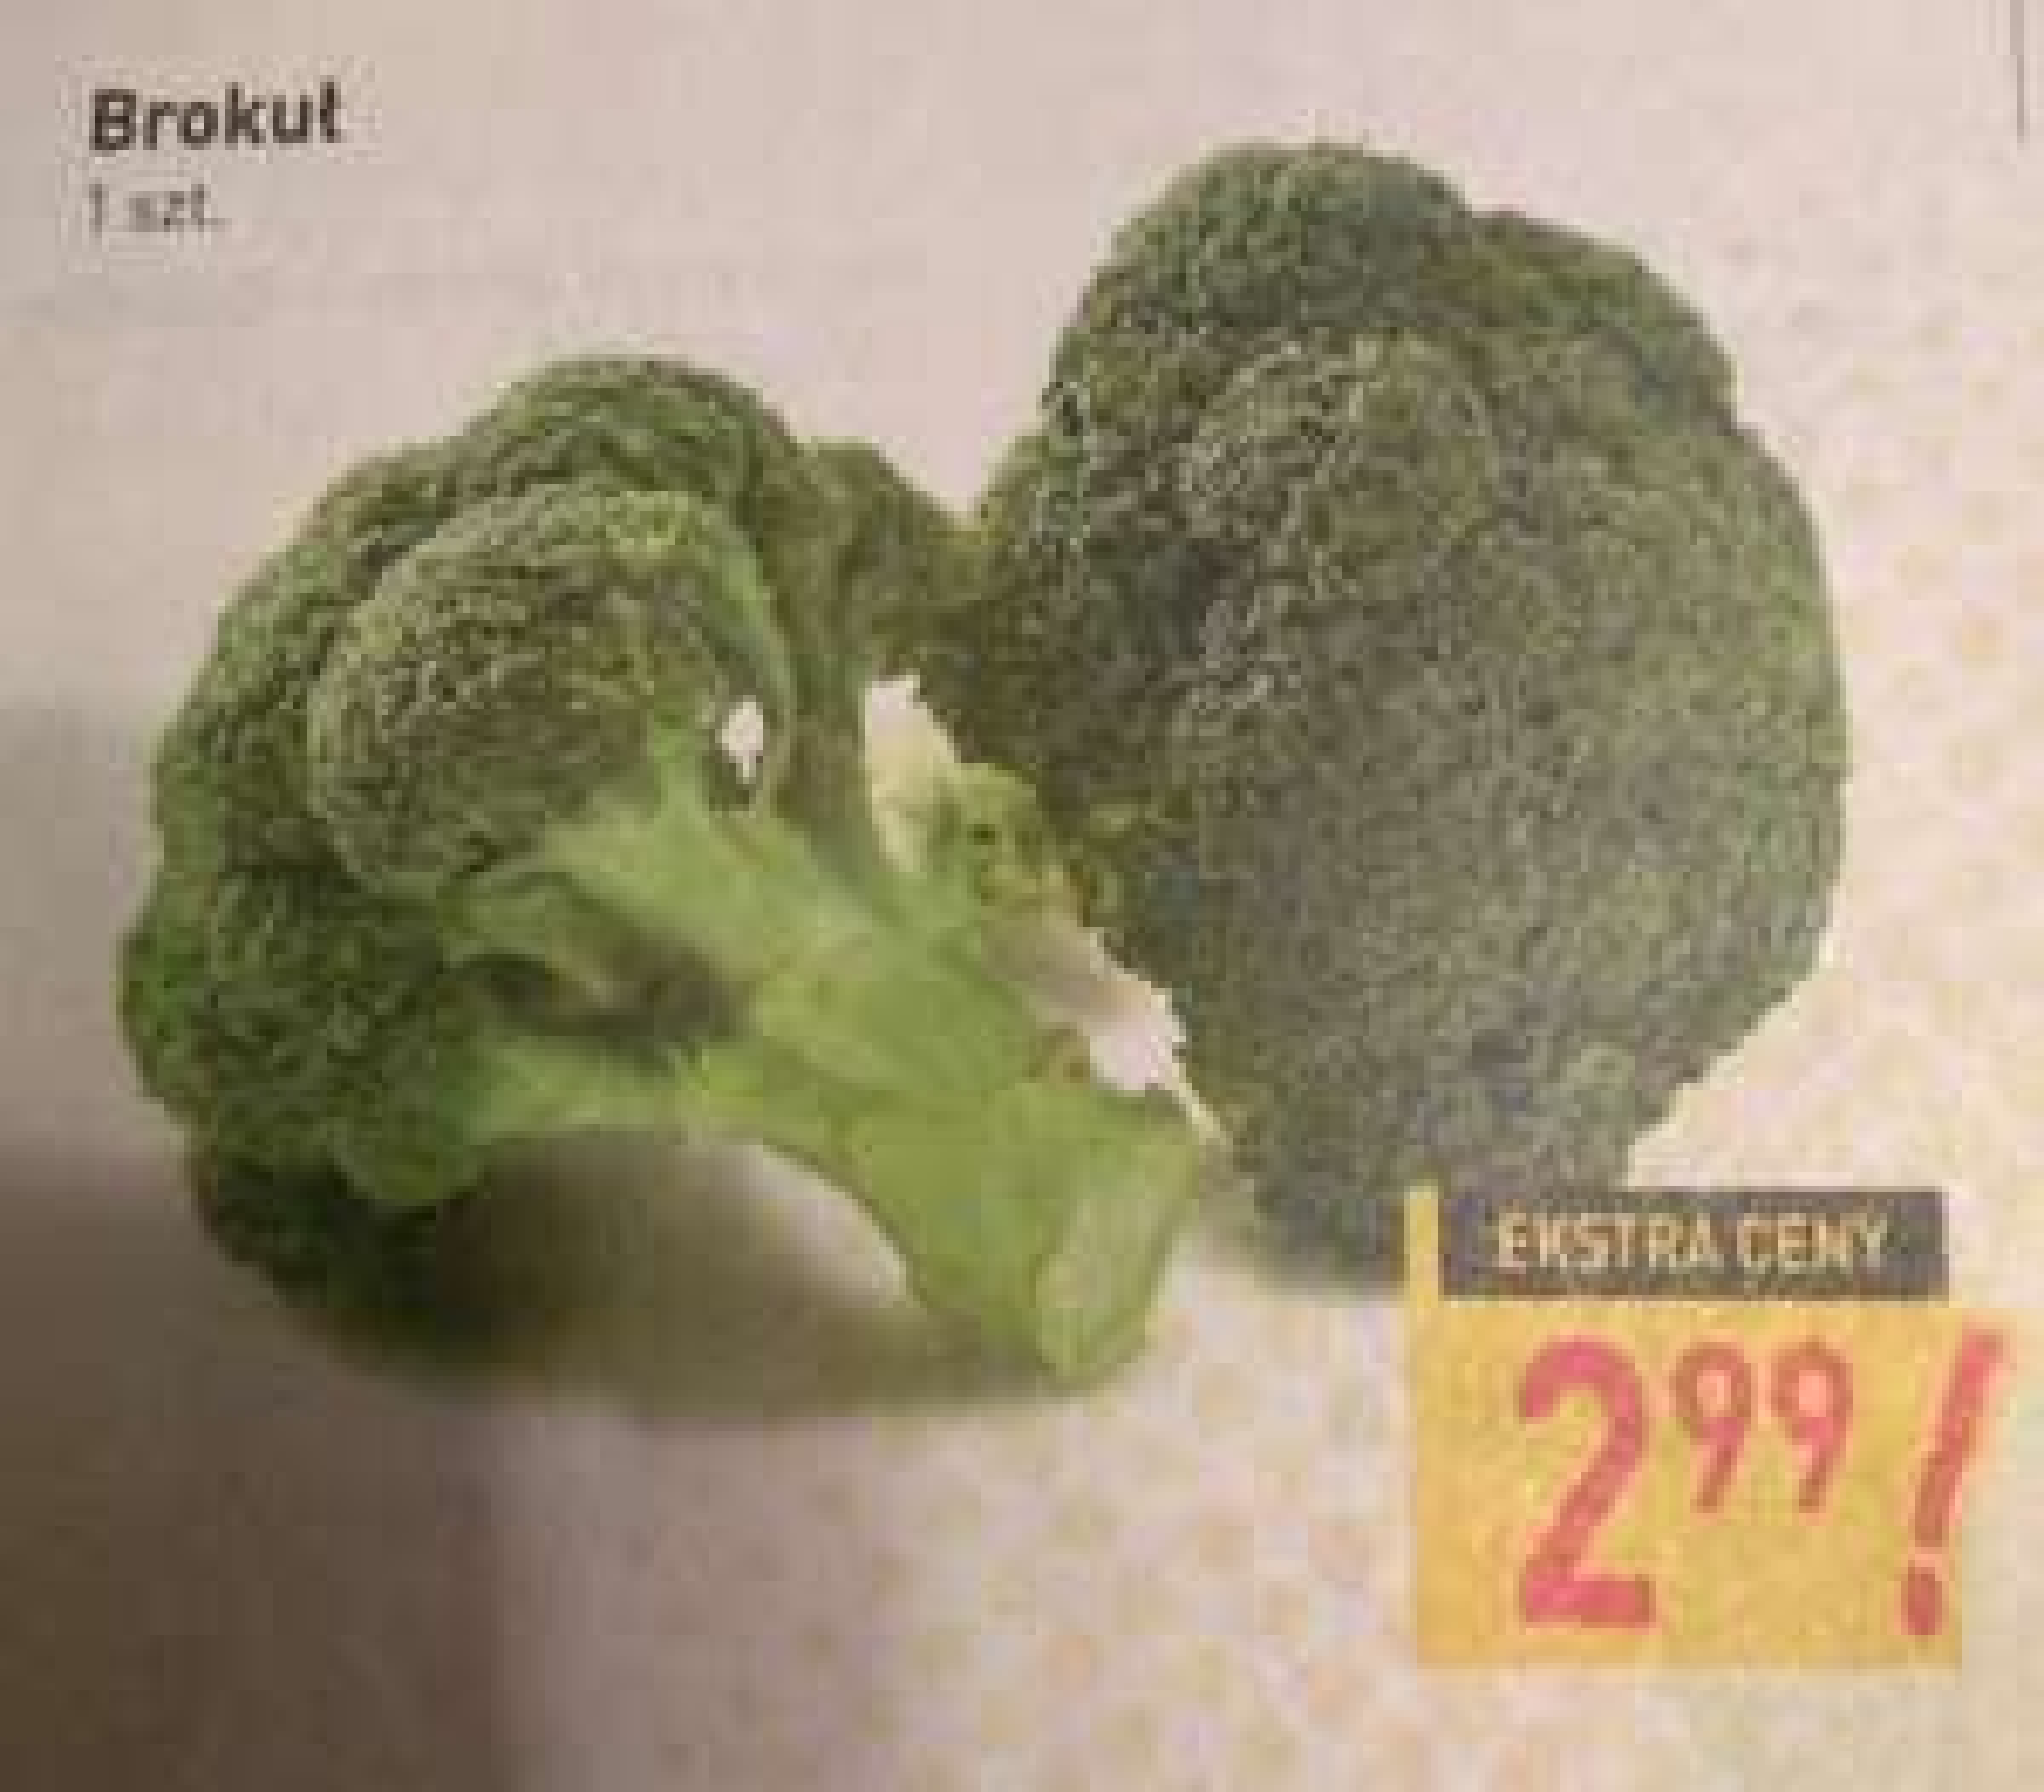 Brokuł 1szt. Stokrotka